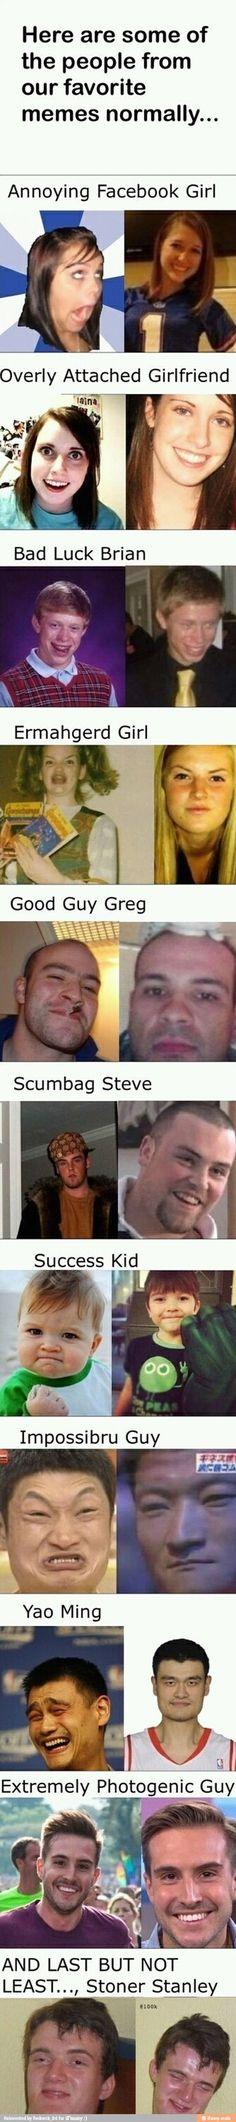 Sooo, extremely photogenic guy is still extremely photogenic, and Stoner Stanley is still Stoner Stanley.